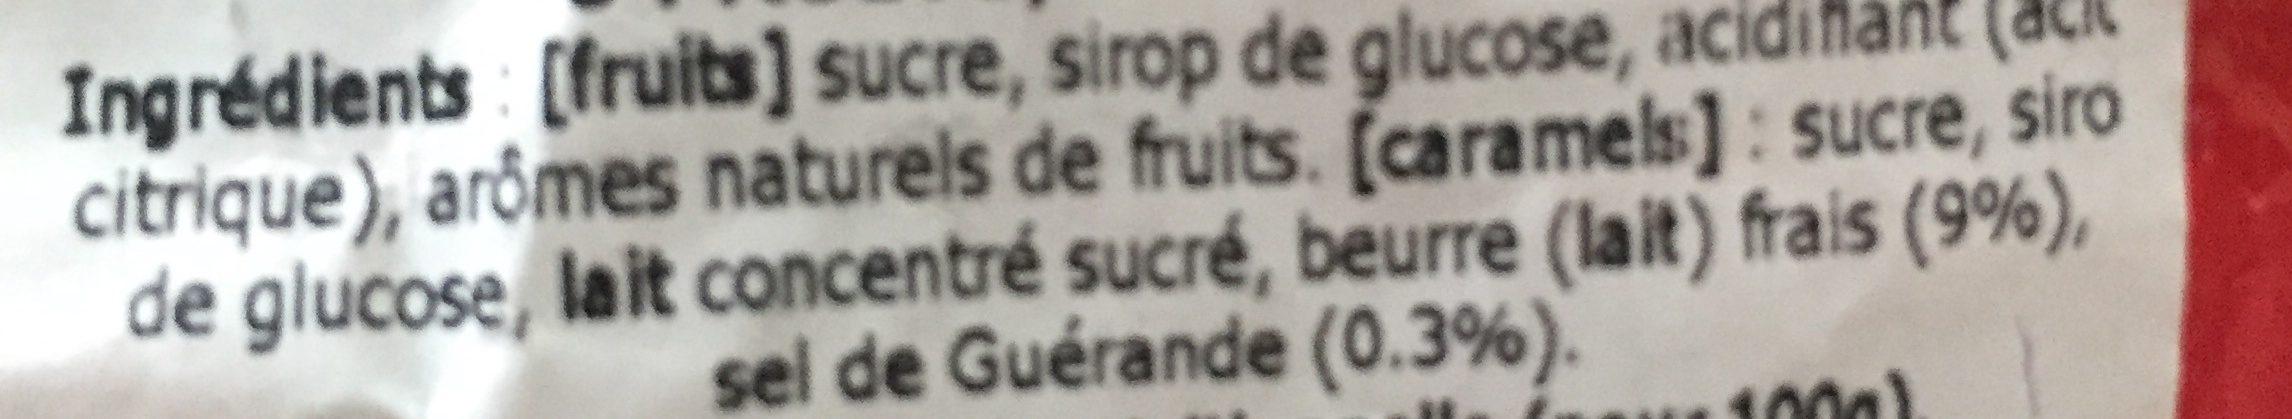 Les niniches 6 fruits, 6 caramels - Ingrediënten - fr